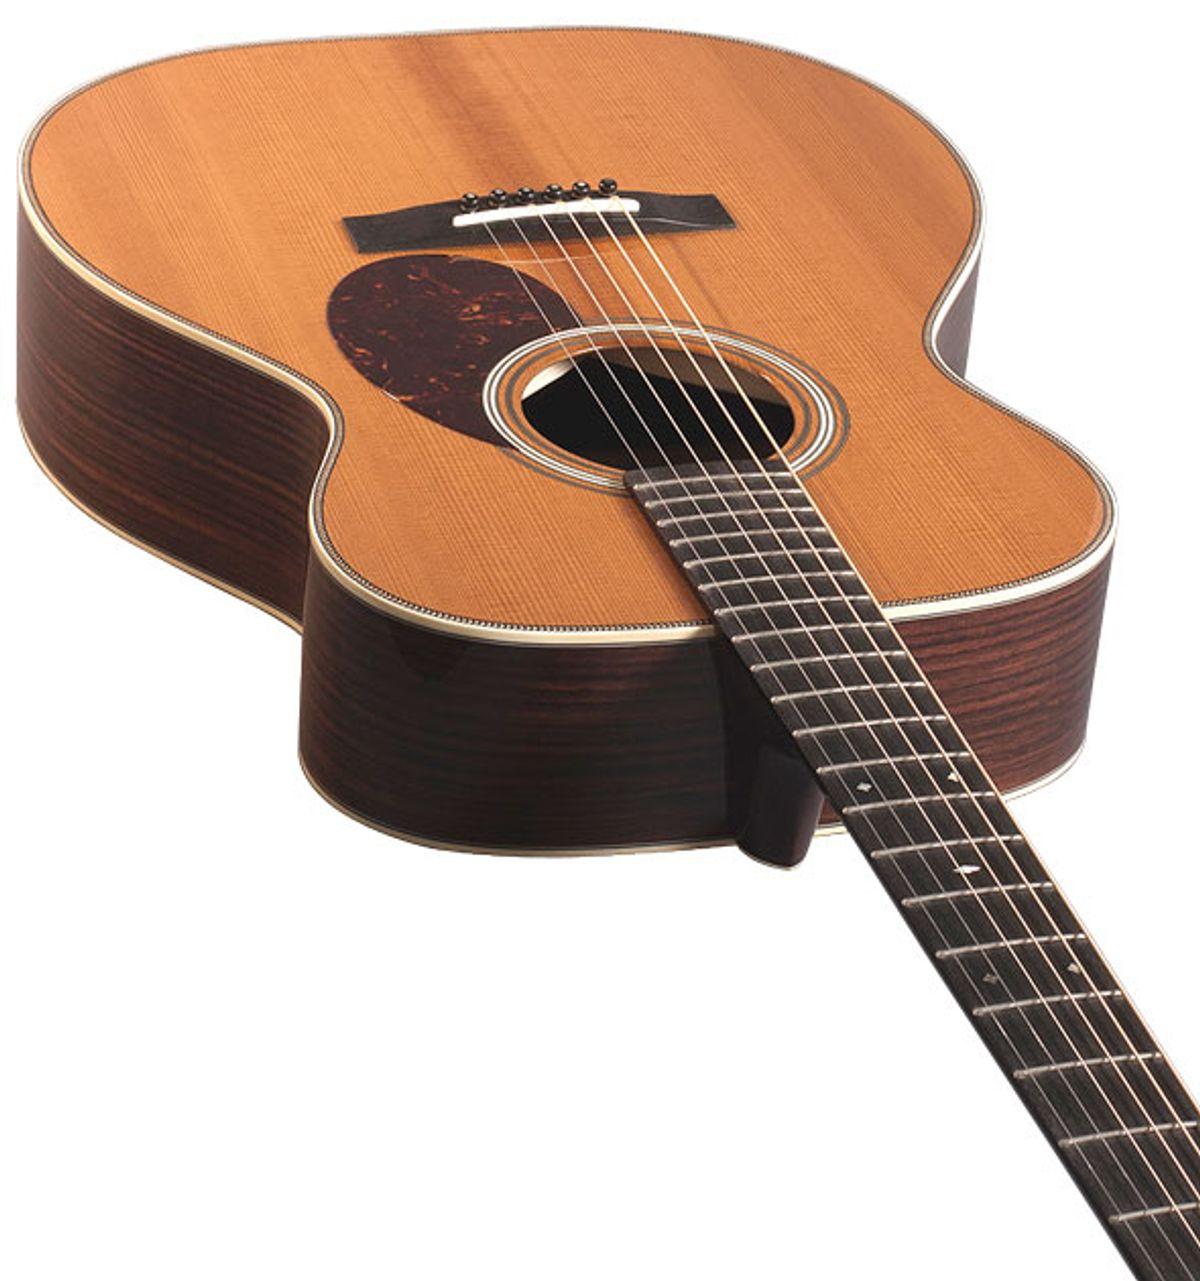 Acoustic Soundboard: Torrefied Woods—Don't be Afraid